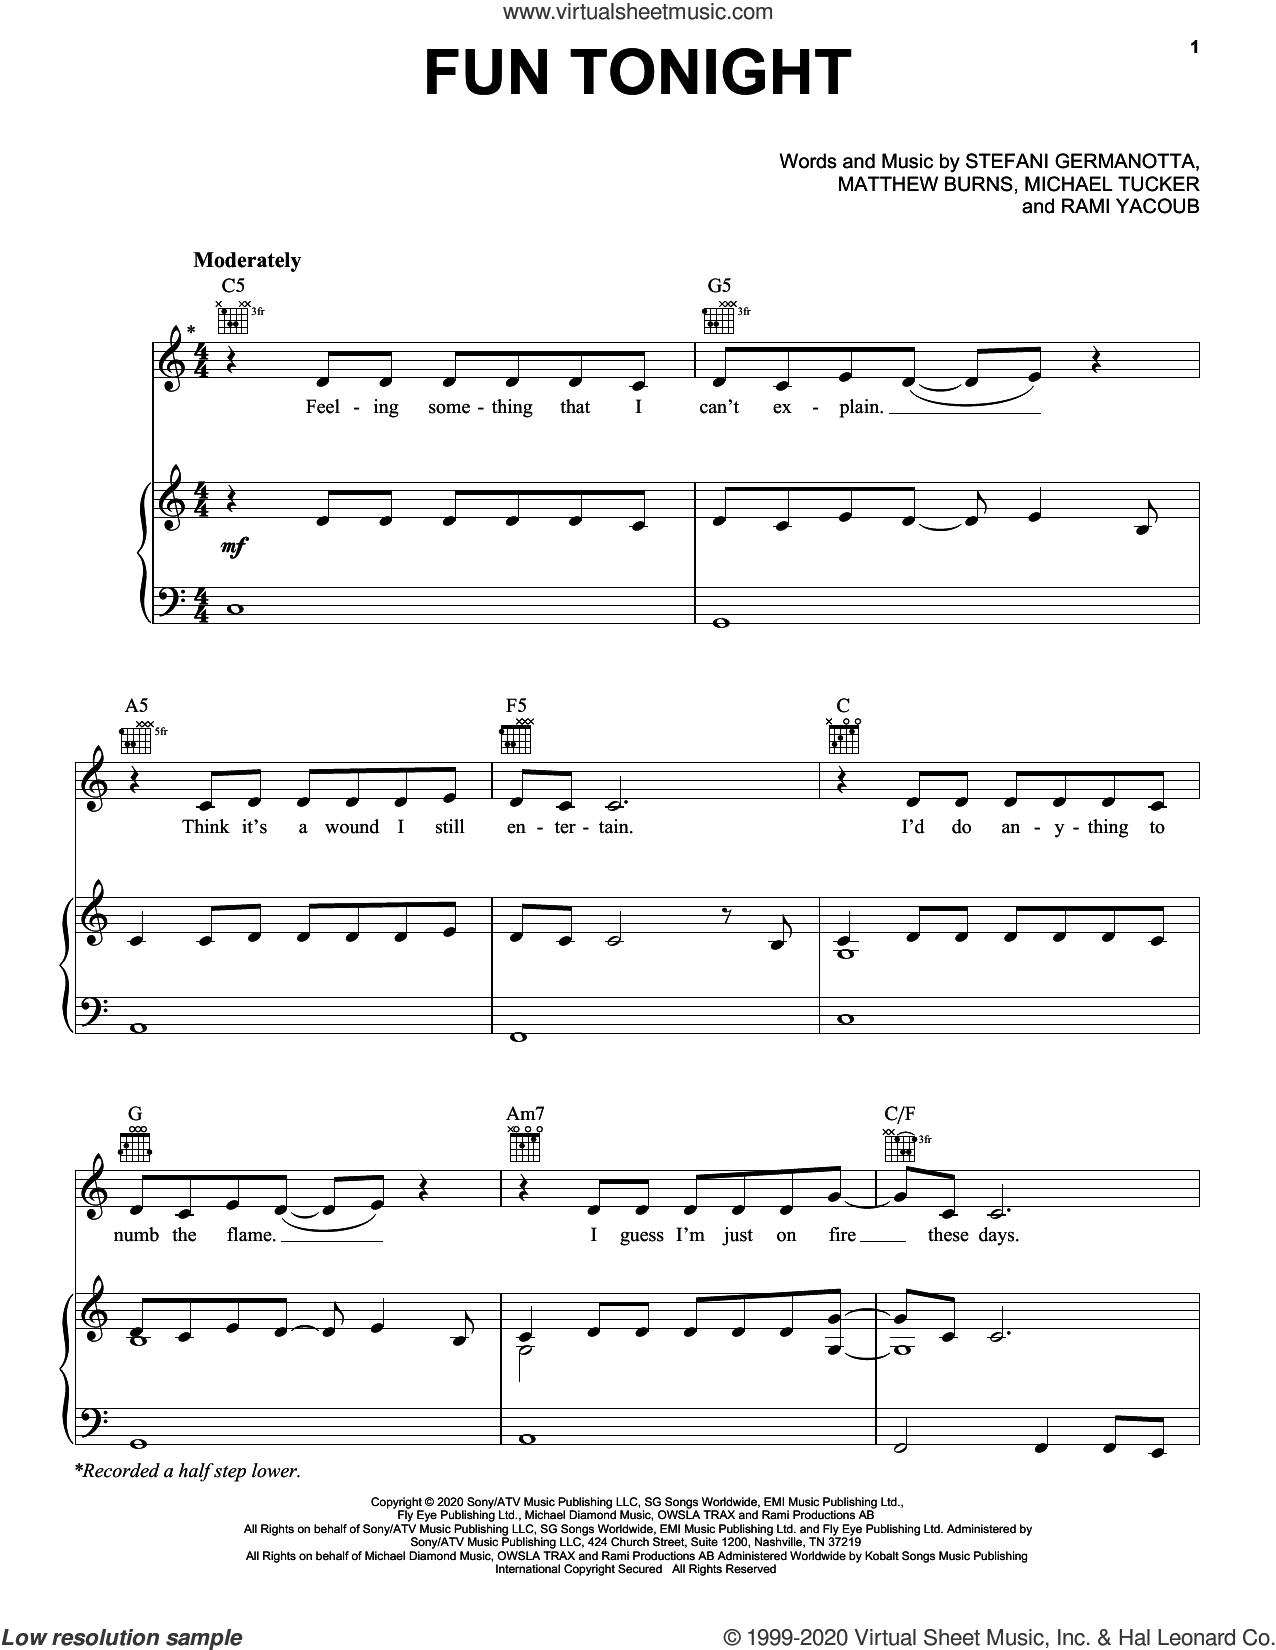 Fun Tonight sheet music for voice, piano or guitar by Lady Gaga, Matthew Burns, Michael Tucker and Rami, intermediate skill level